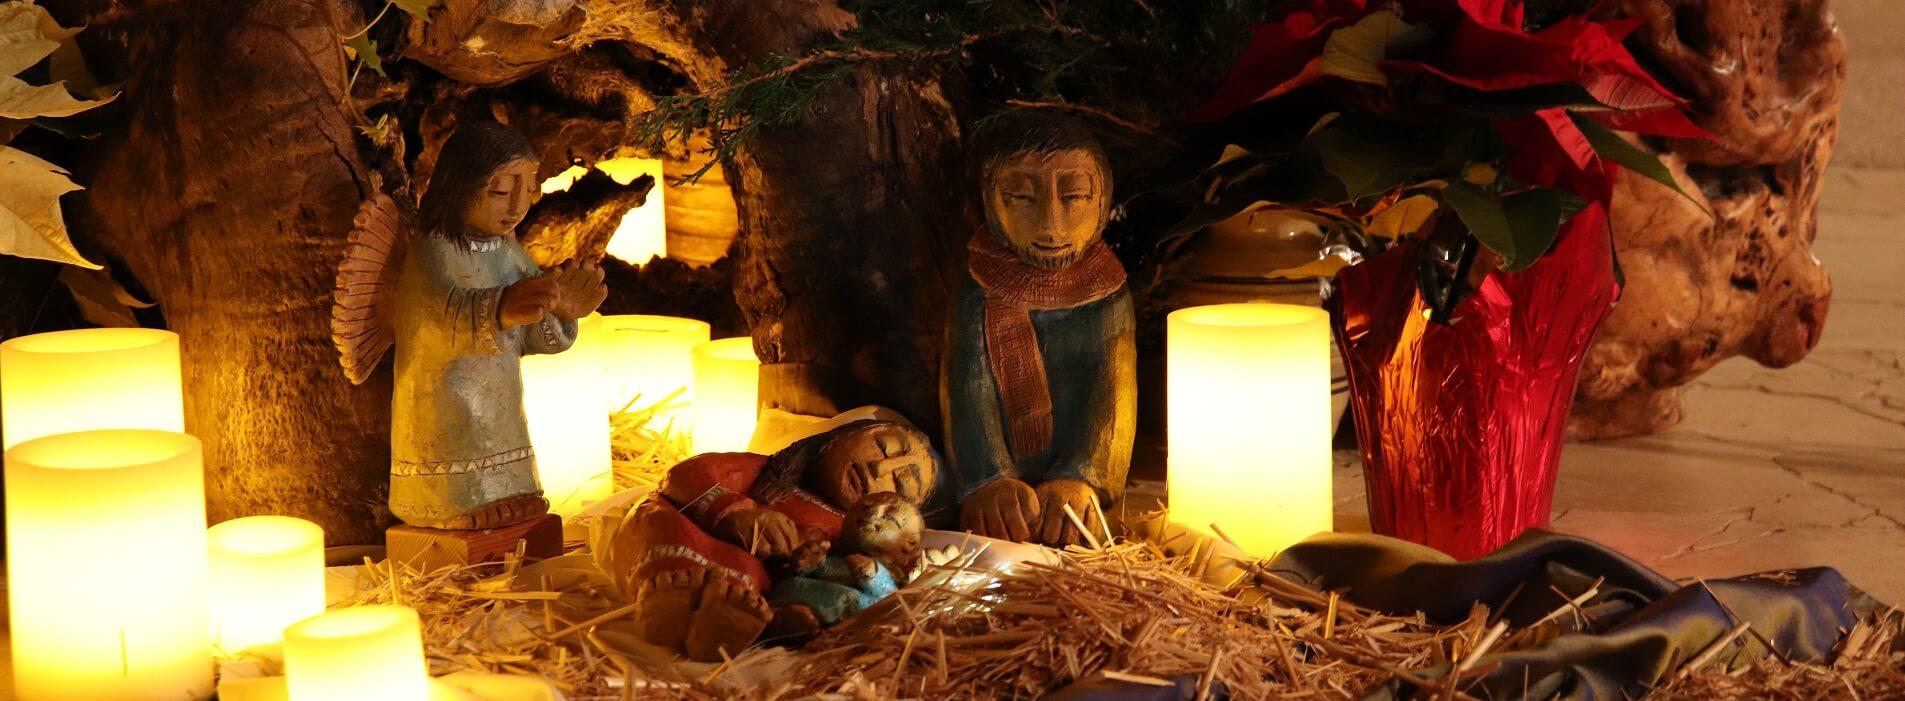 Image 1 – 2019 12 25 Christmas creche